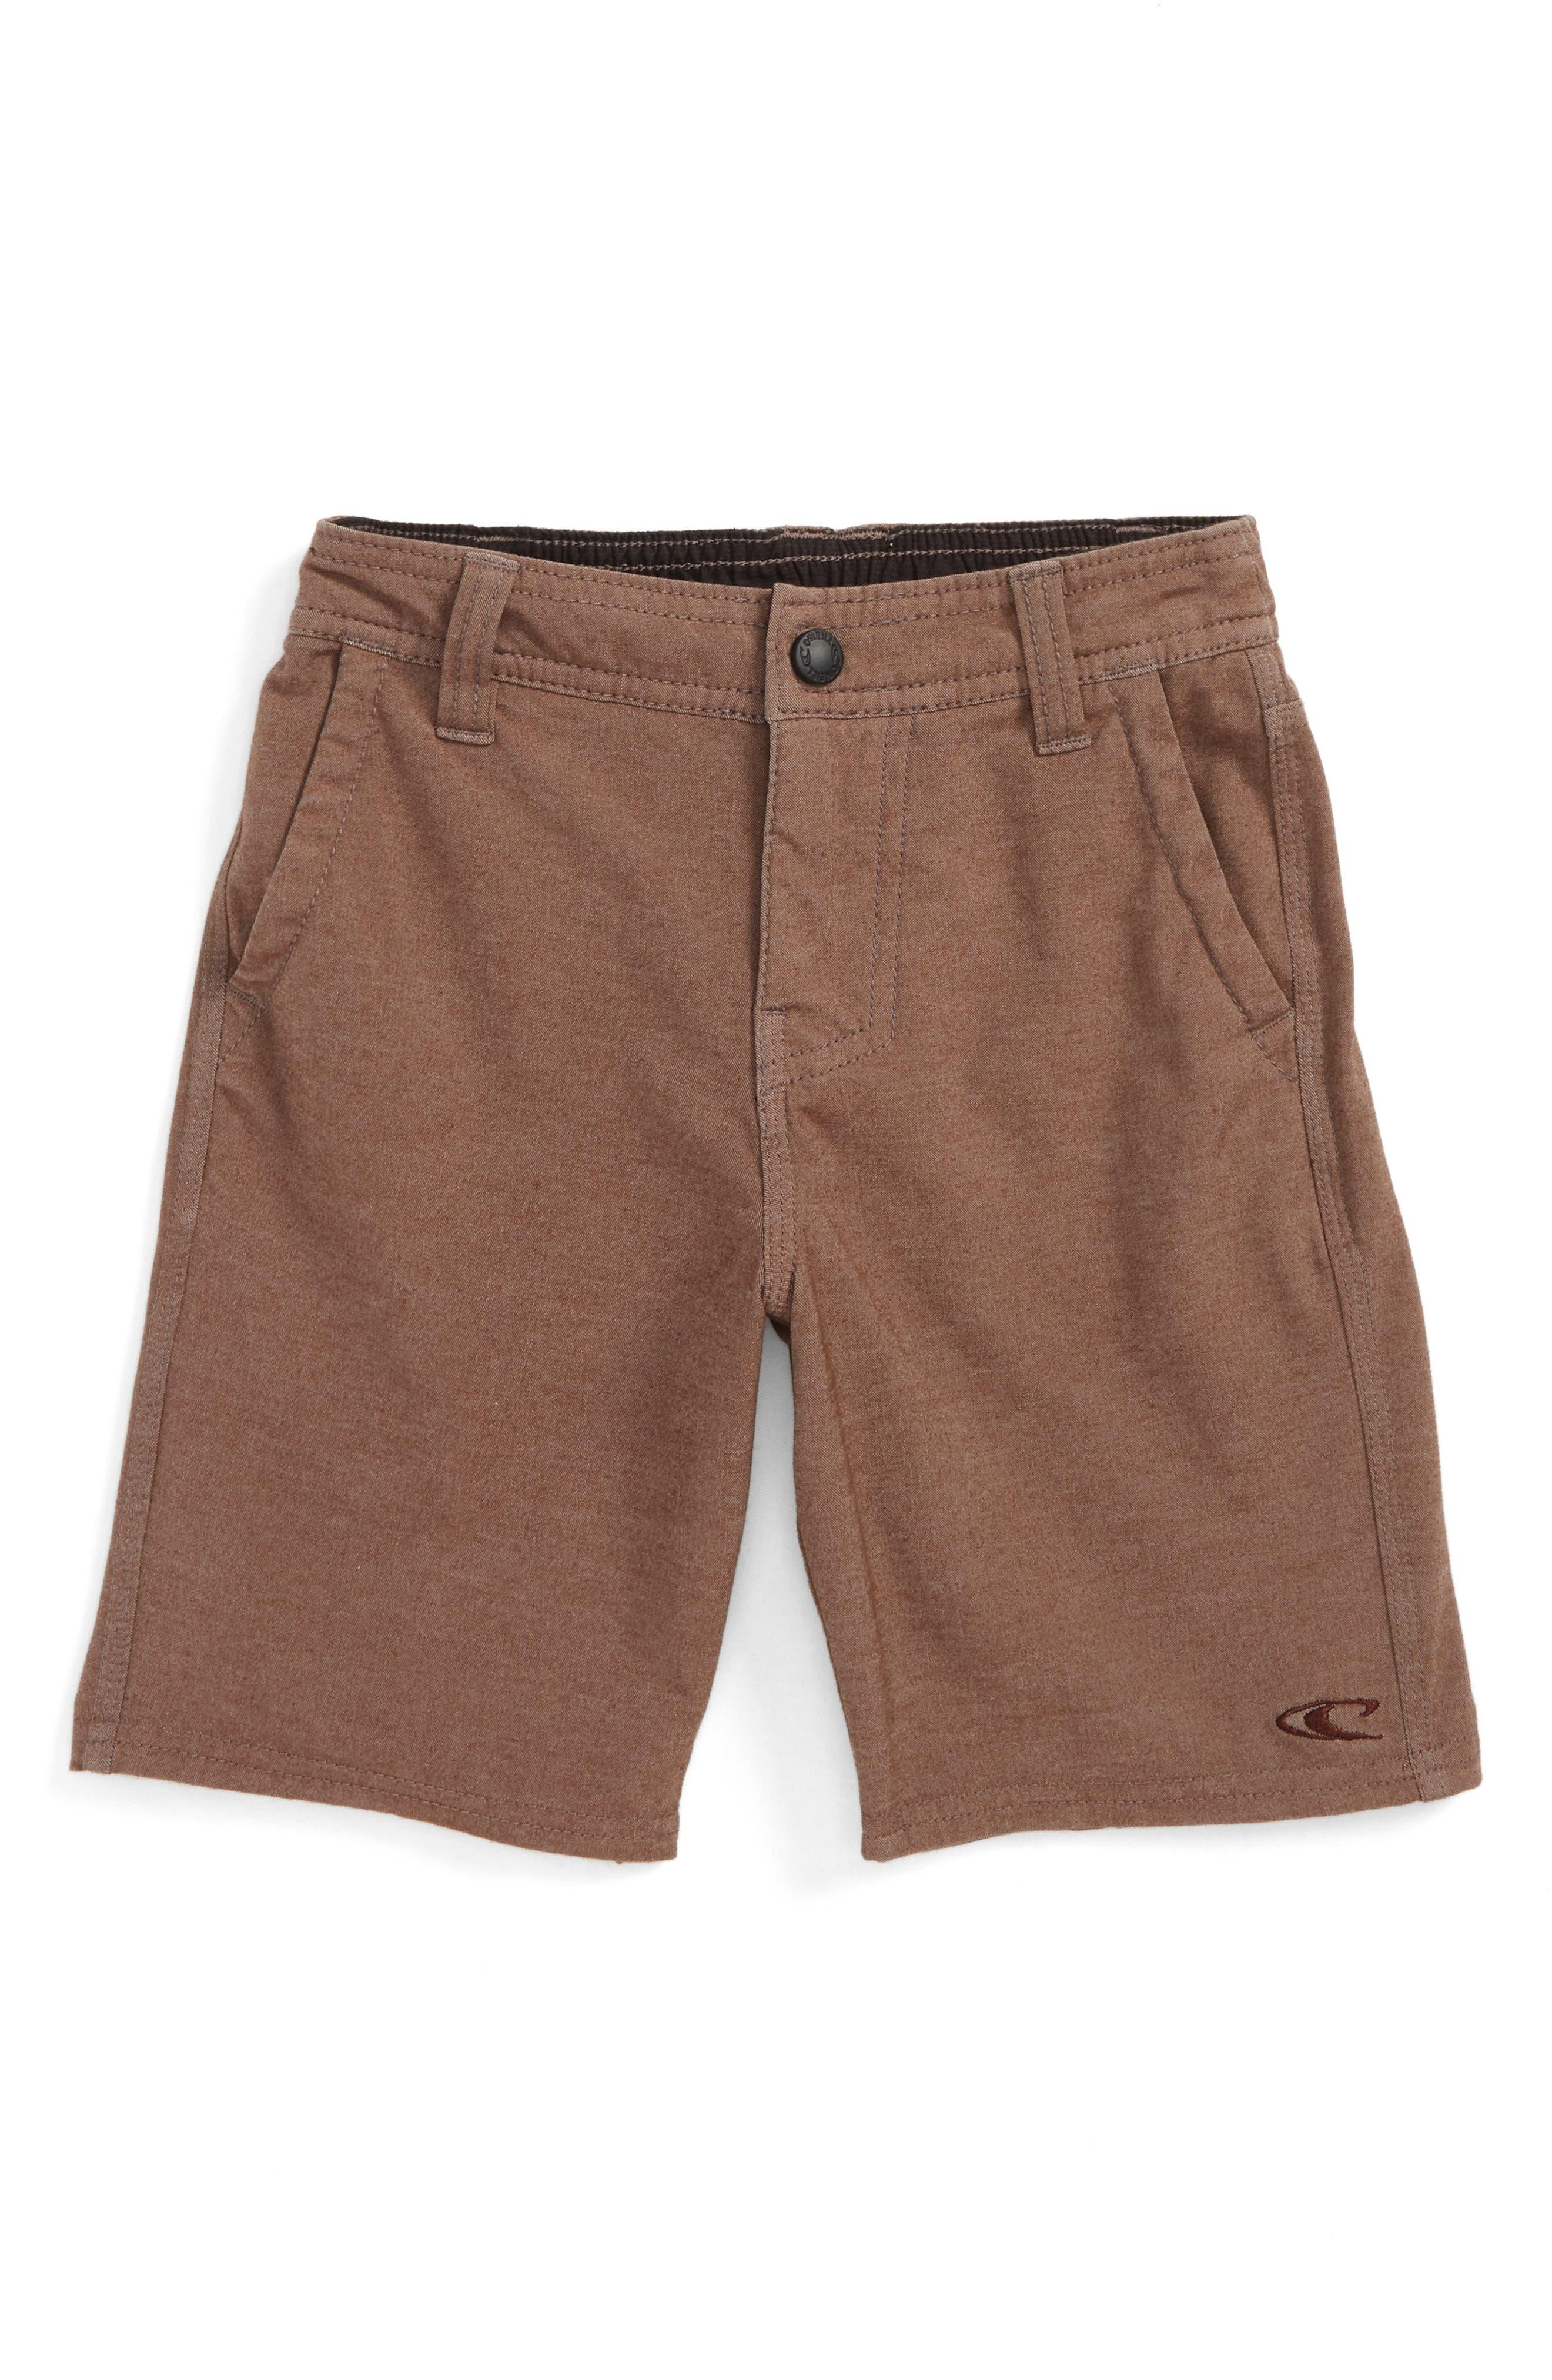 O'Neill Locked Hybrid Board Shorts (Little Boys)